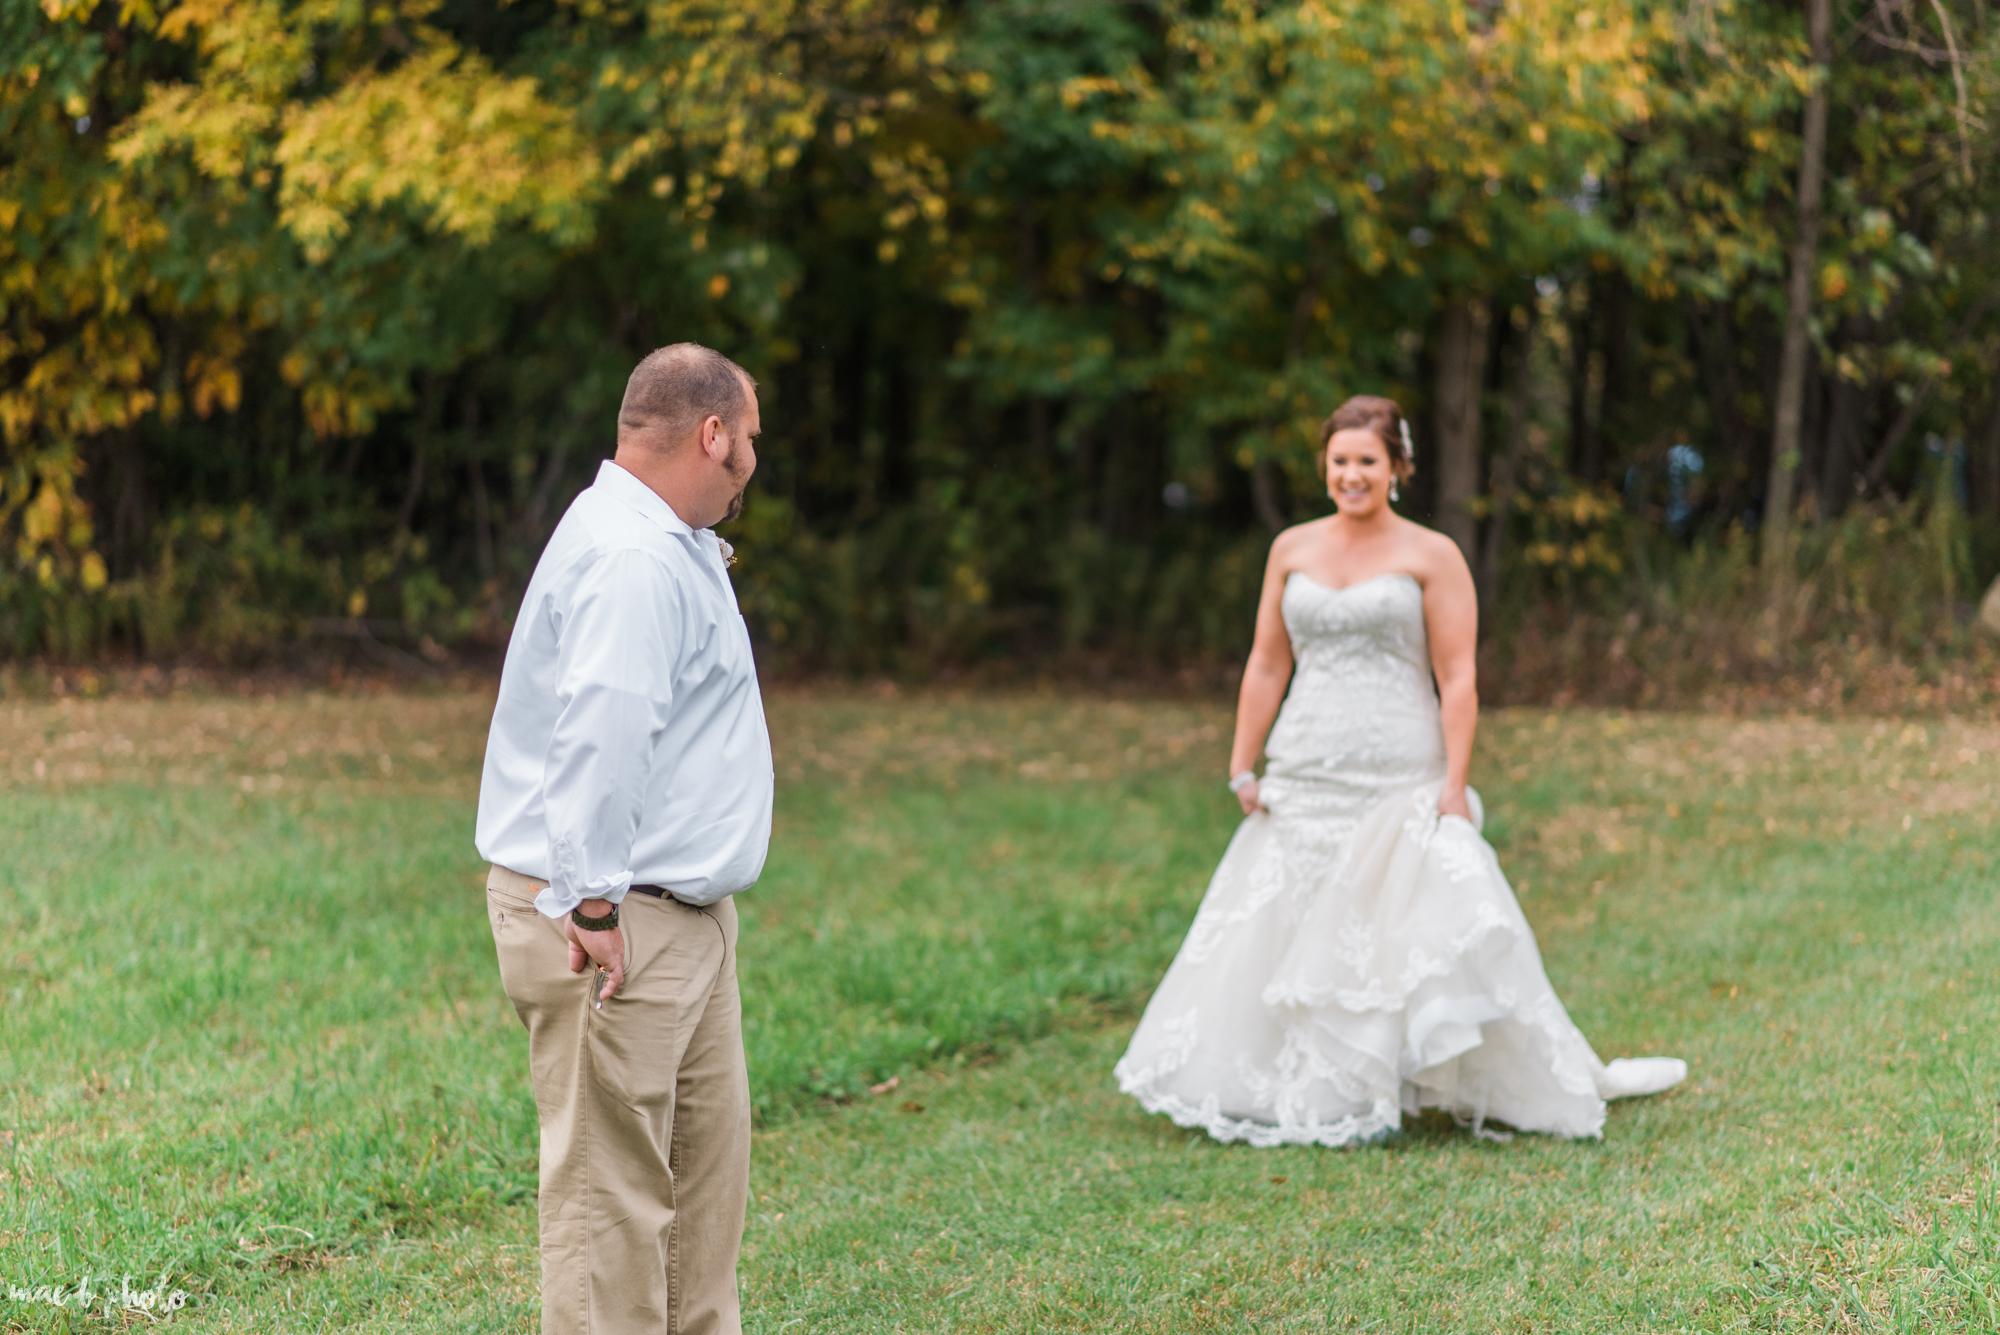 sarah and dustin's intimate fall barn wedding at hartford hill winery in hartford ohio-1.jpg